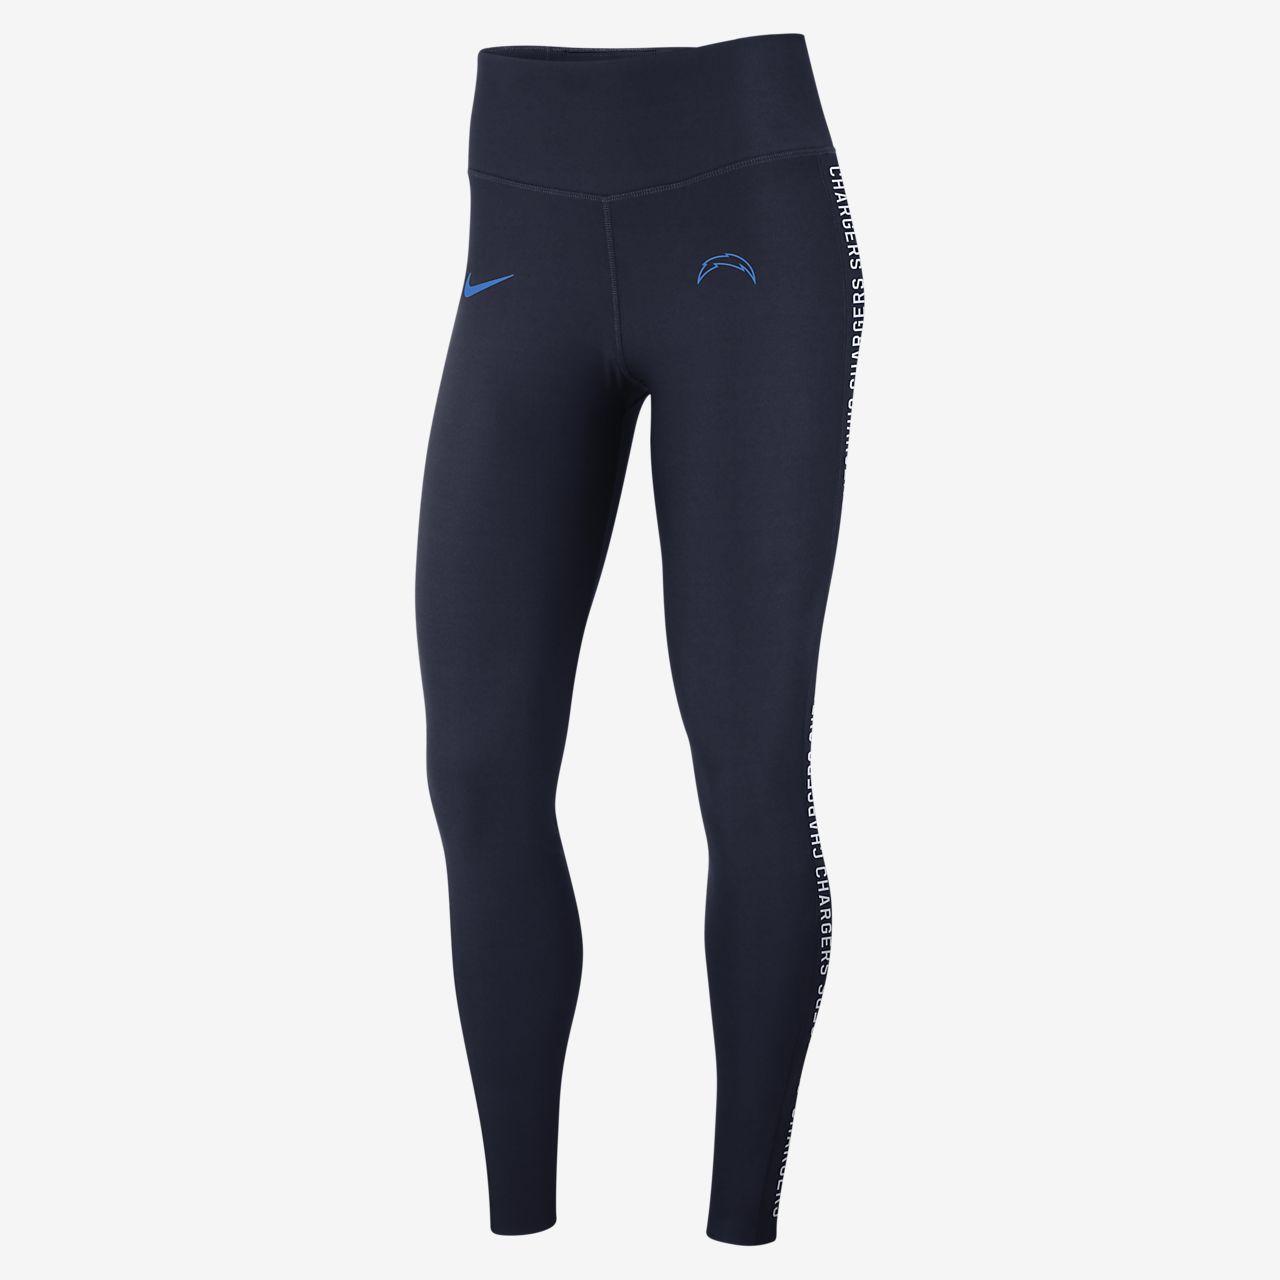 Nike Dri-FIT (NFL Chargers) Women's Leggings